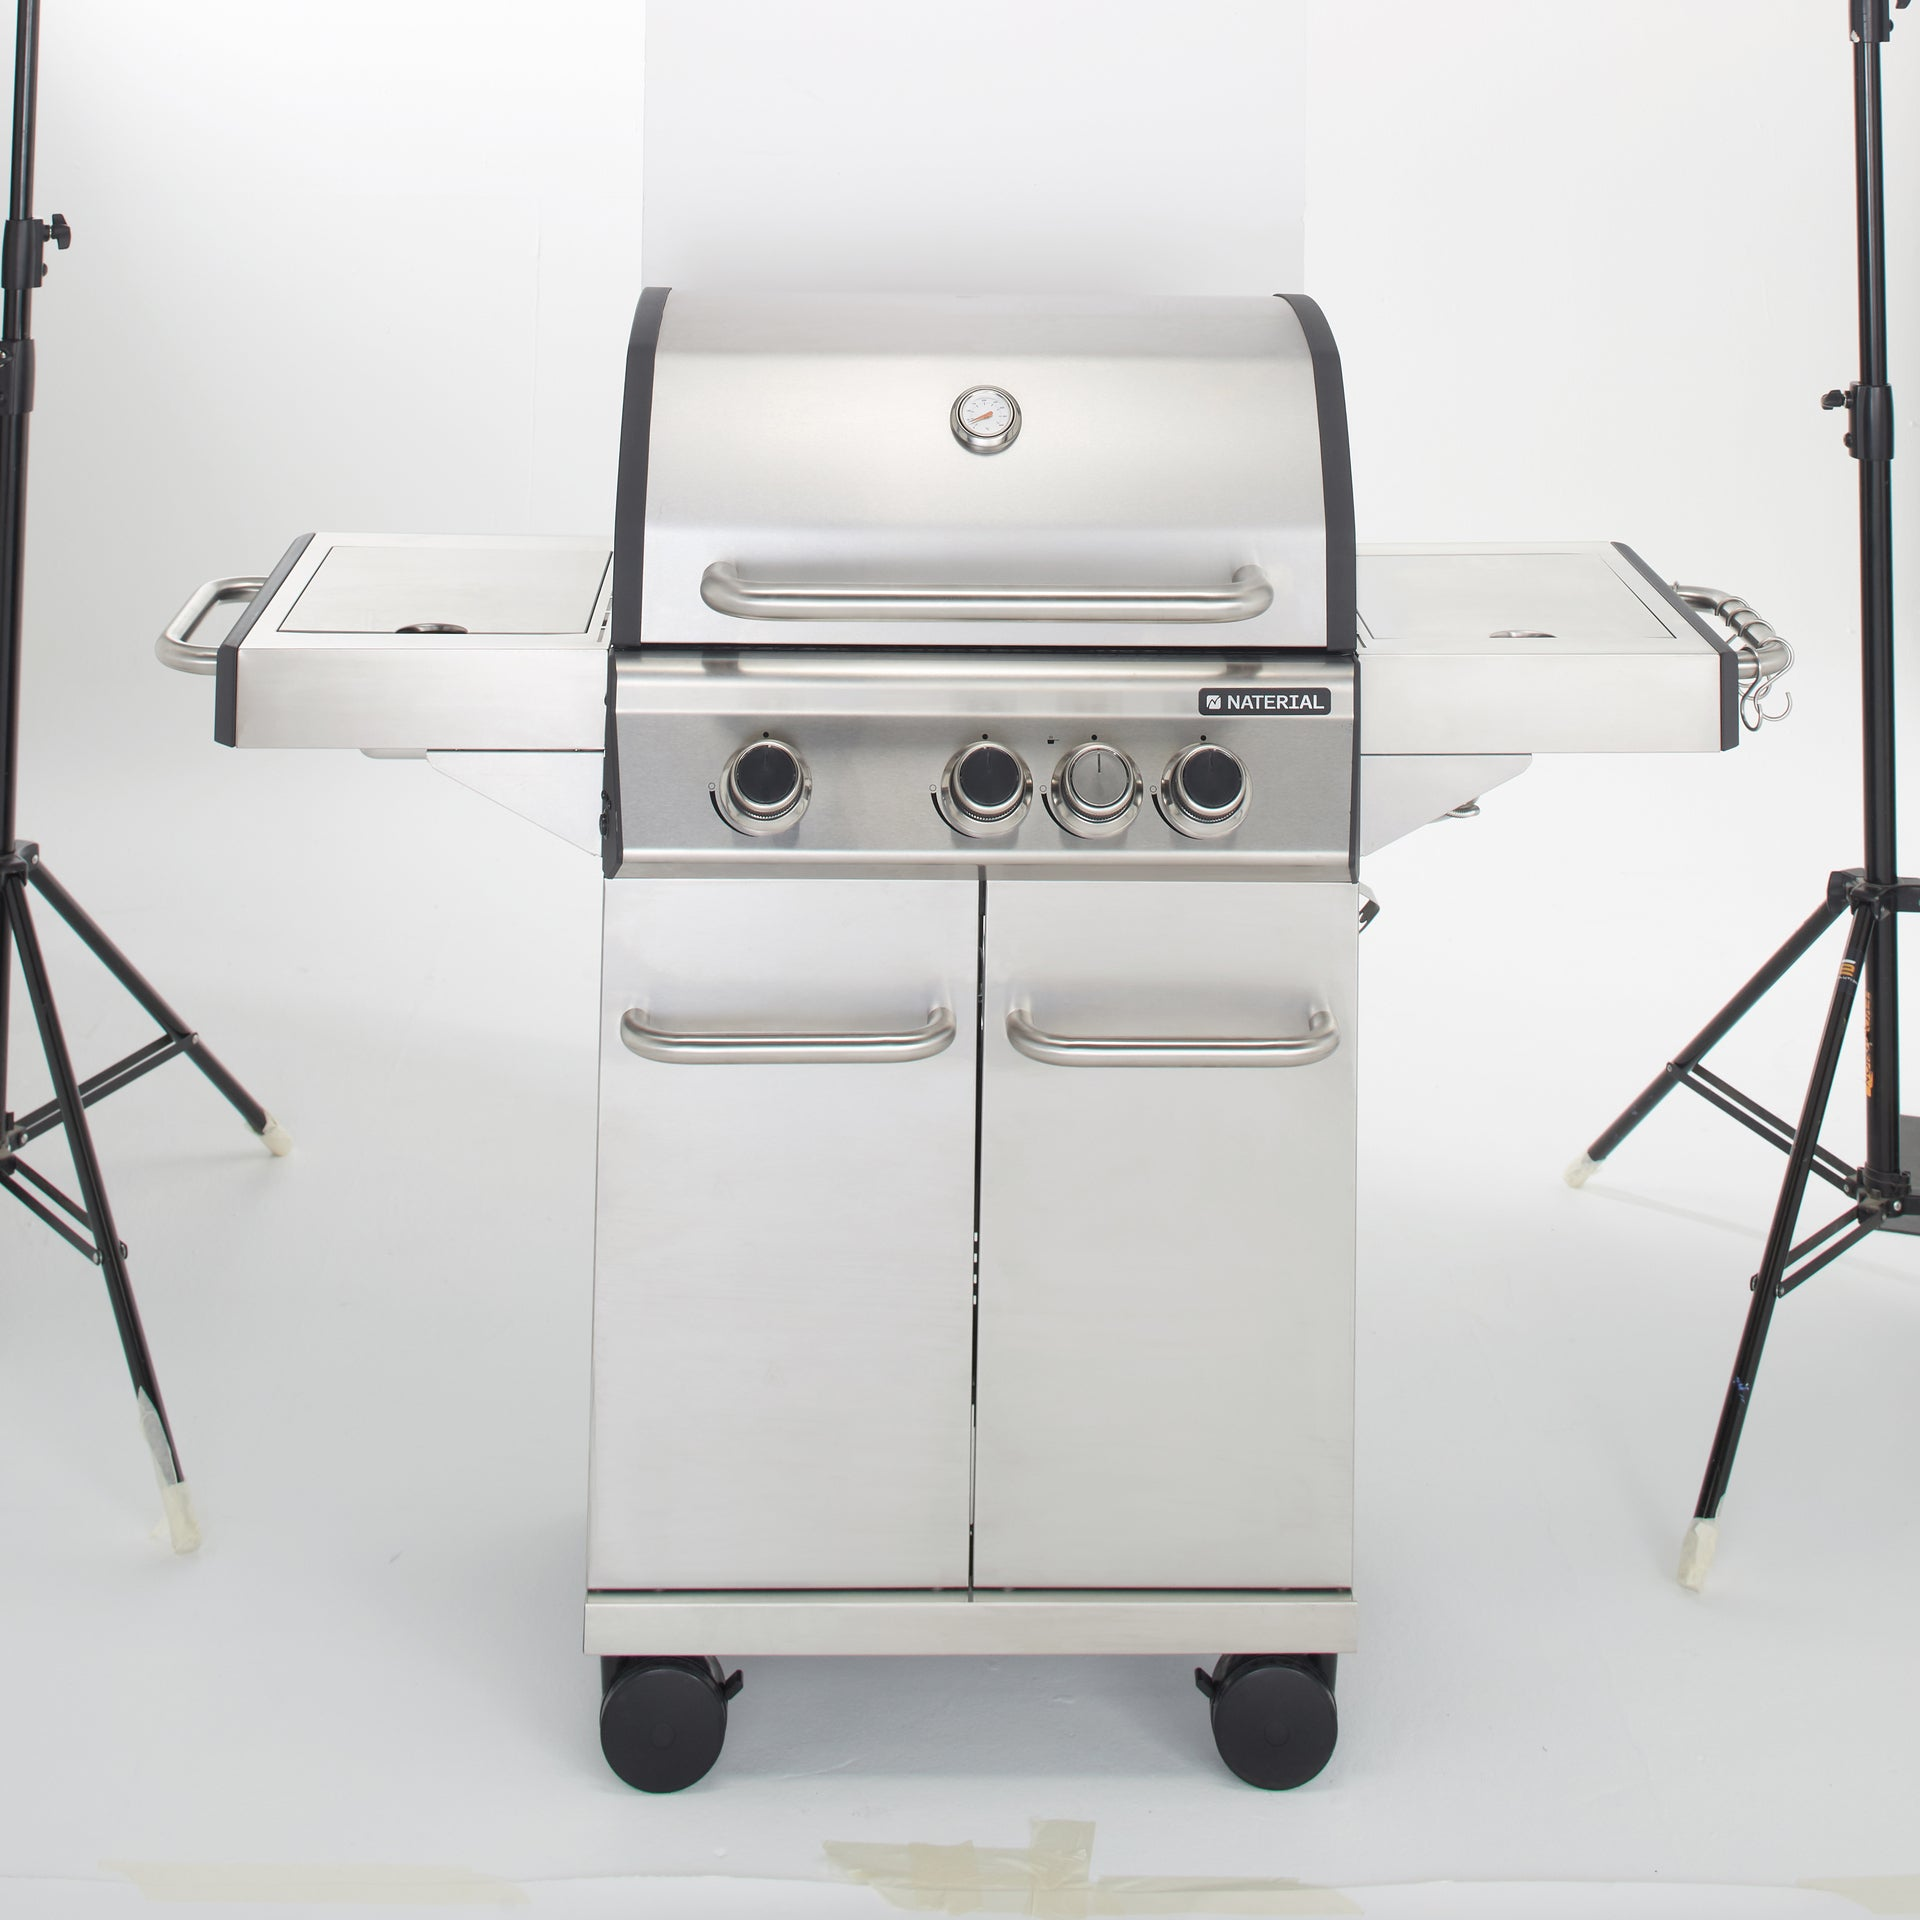 Barbecue au gaz 142 x 55 x 118 cm NATERIAL Hudson, 4